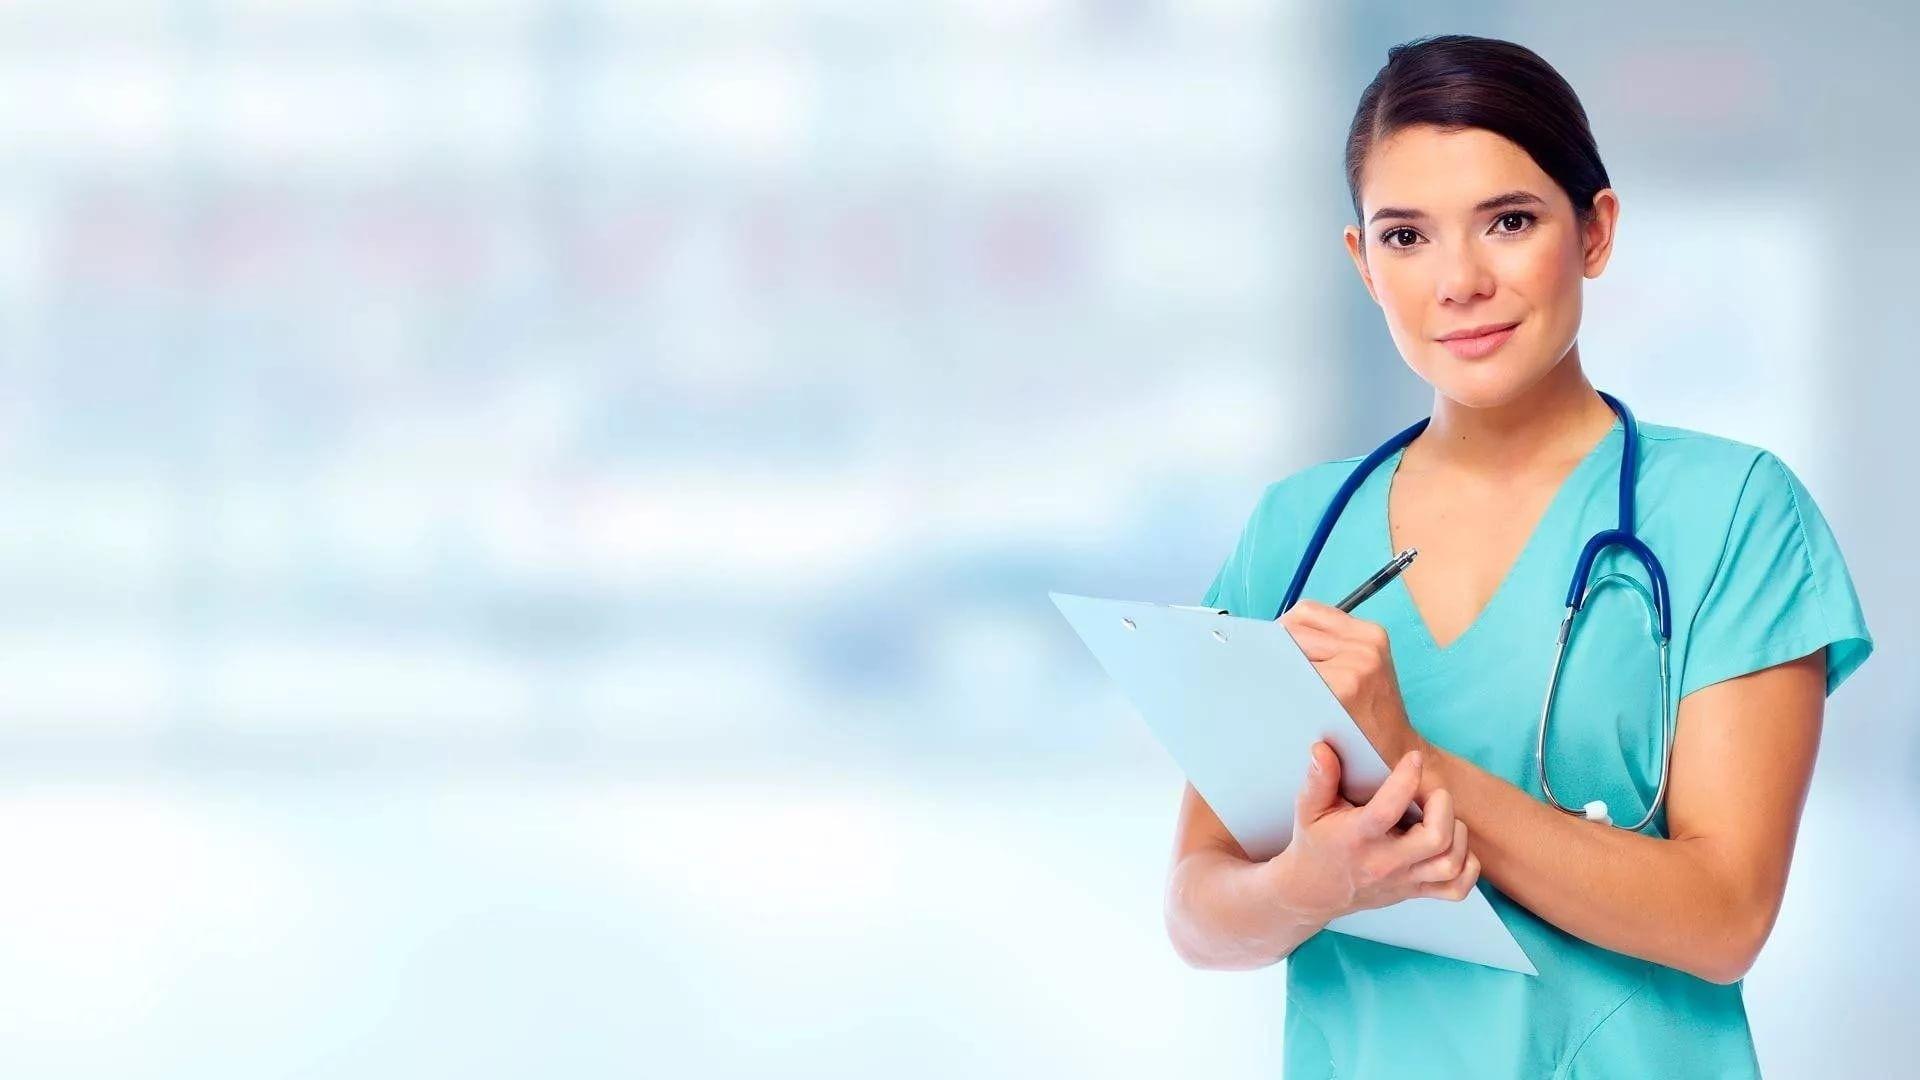 Medical hd desktop wallpaper